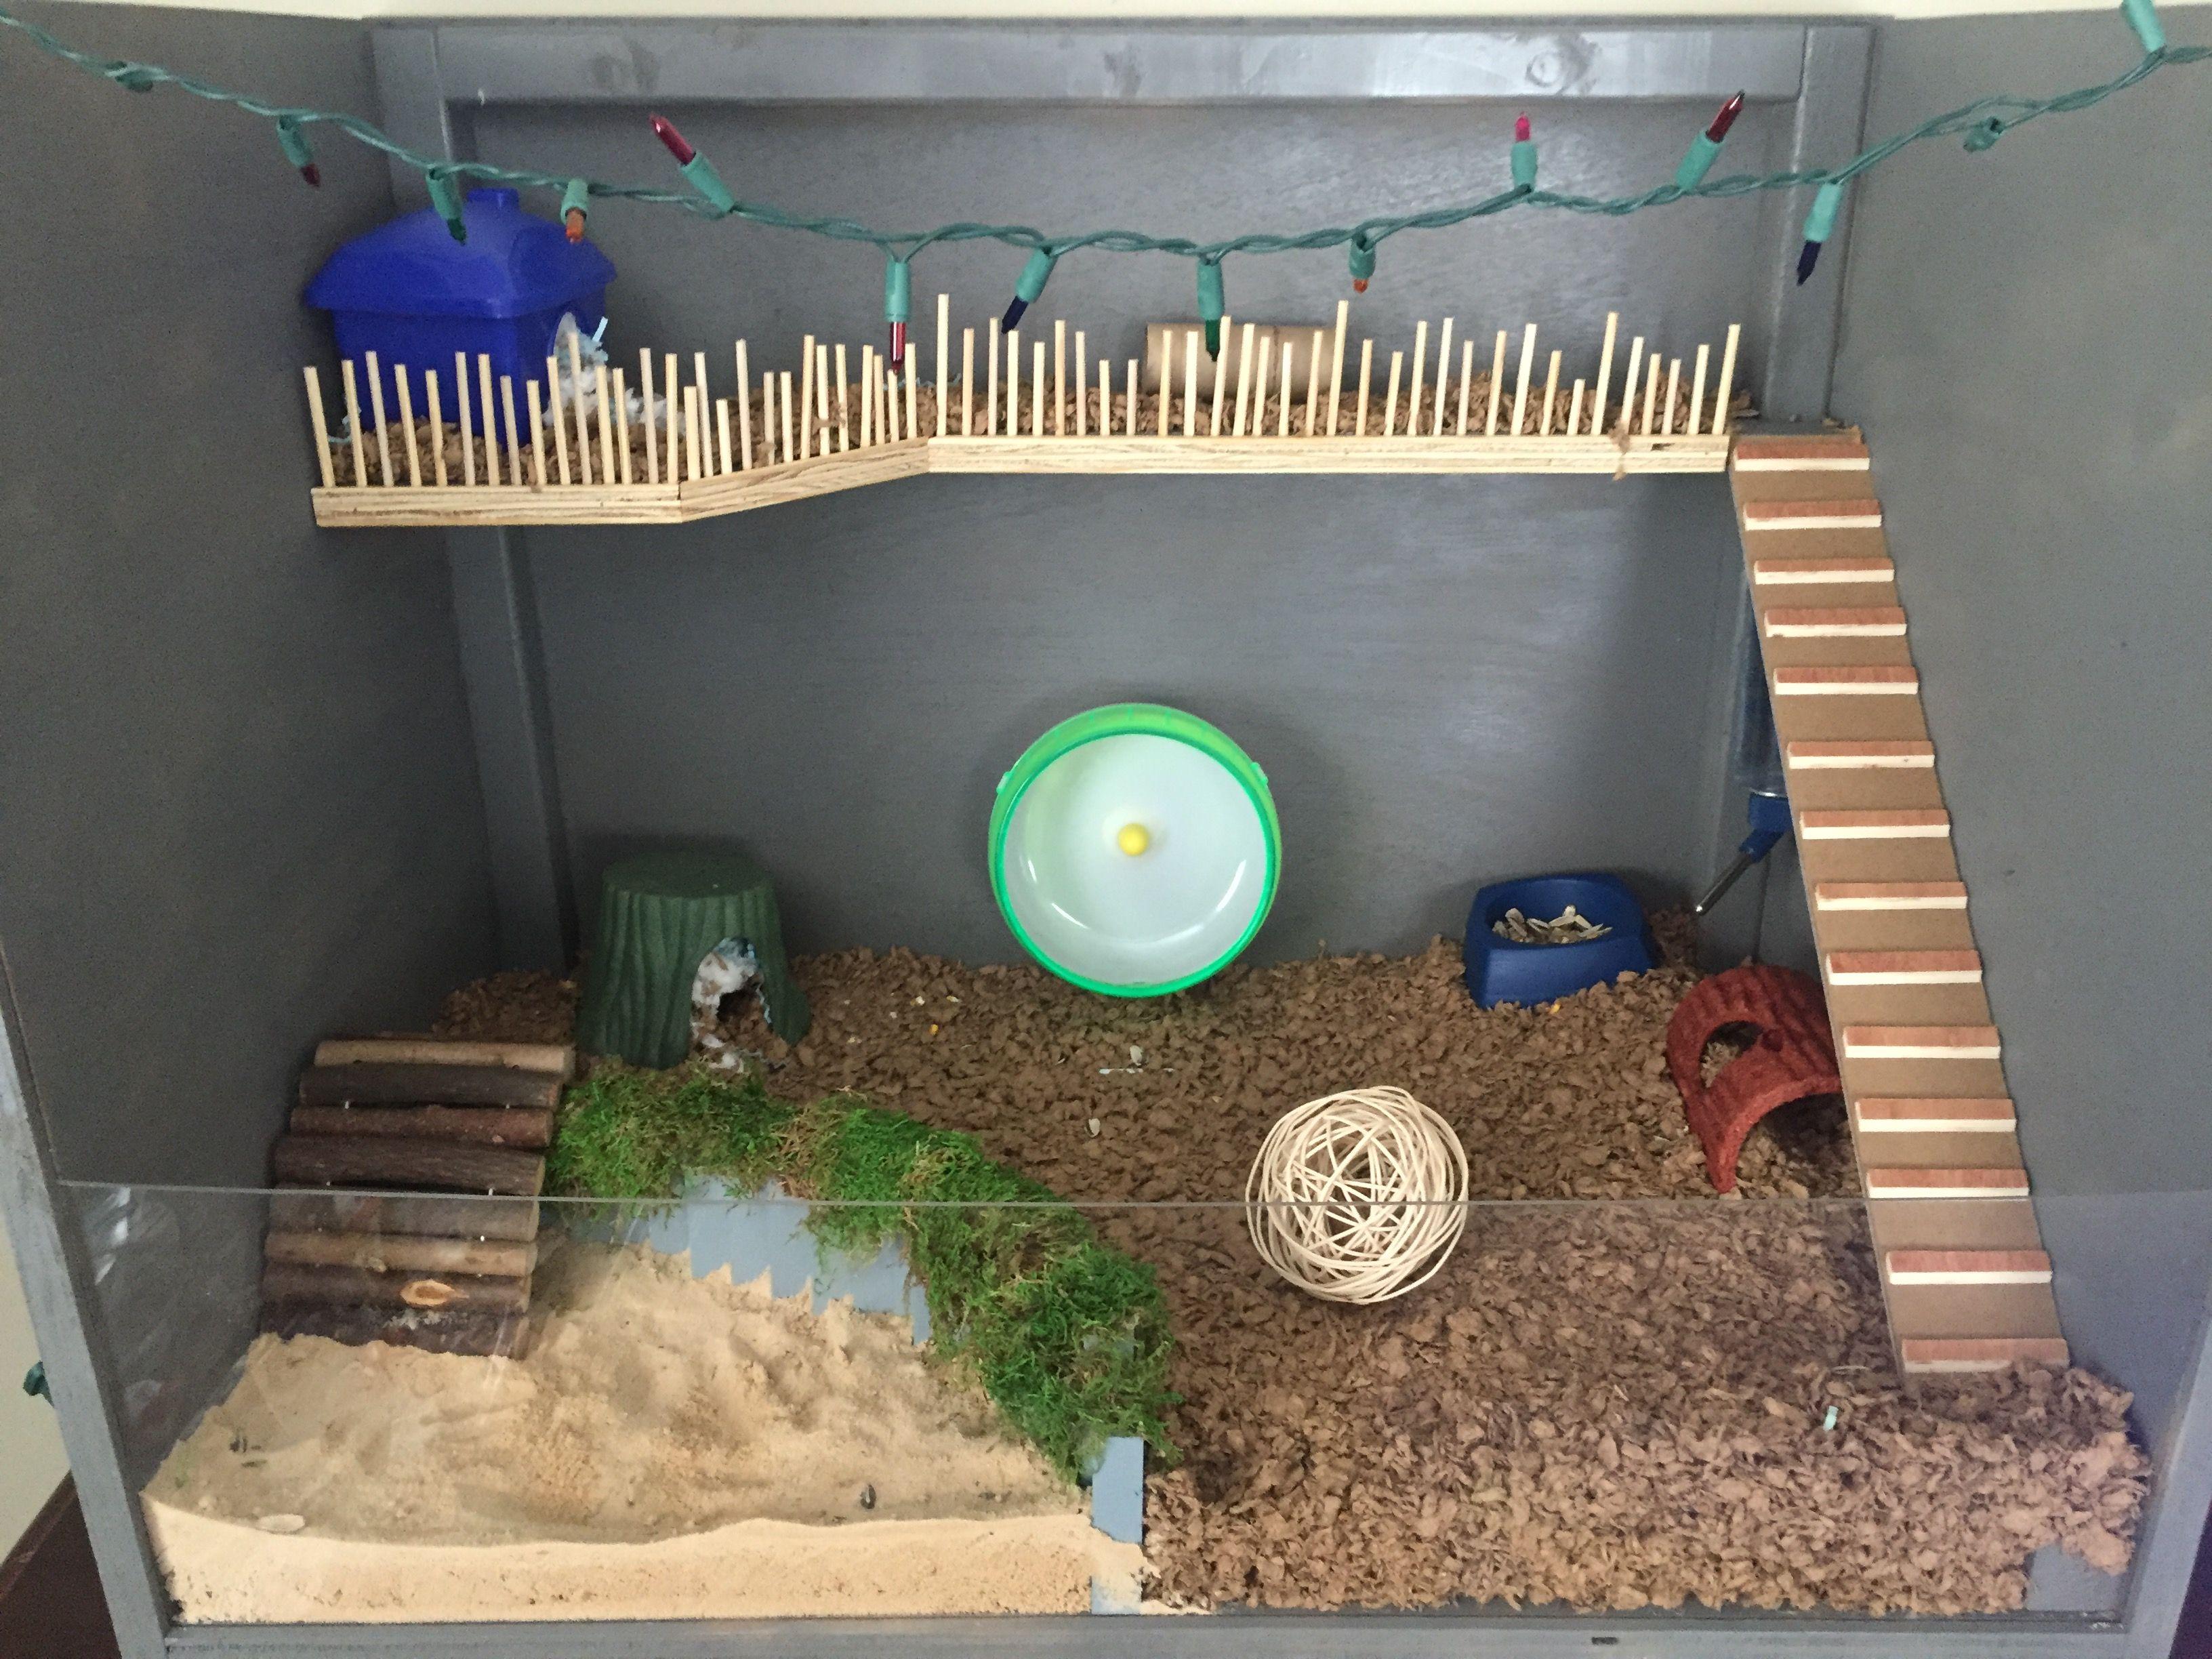 Diy Dwarf Hamster Cage All Custom Made Christmas Lights Just For Show Hamster Toys Hamster Diy Diy Hamster Toys